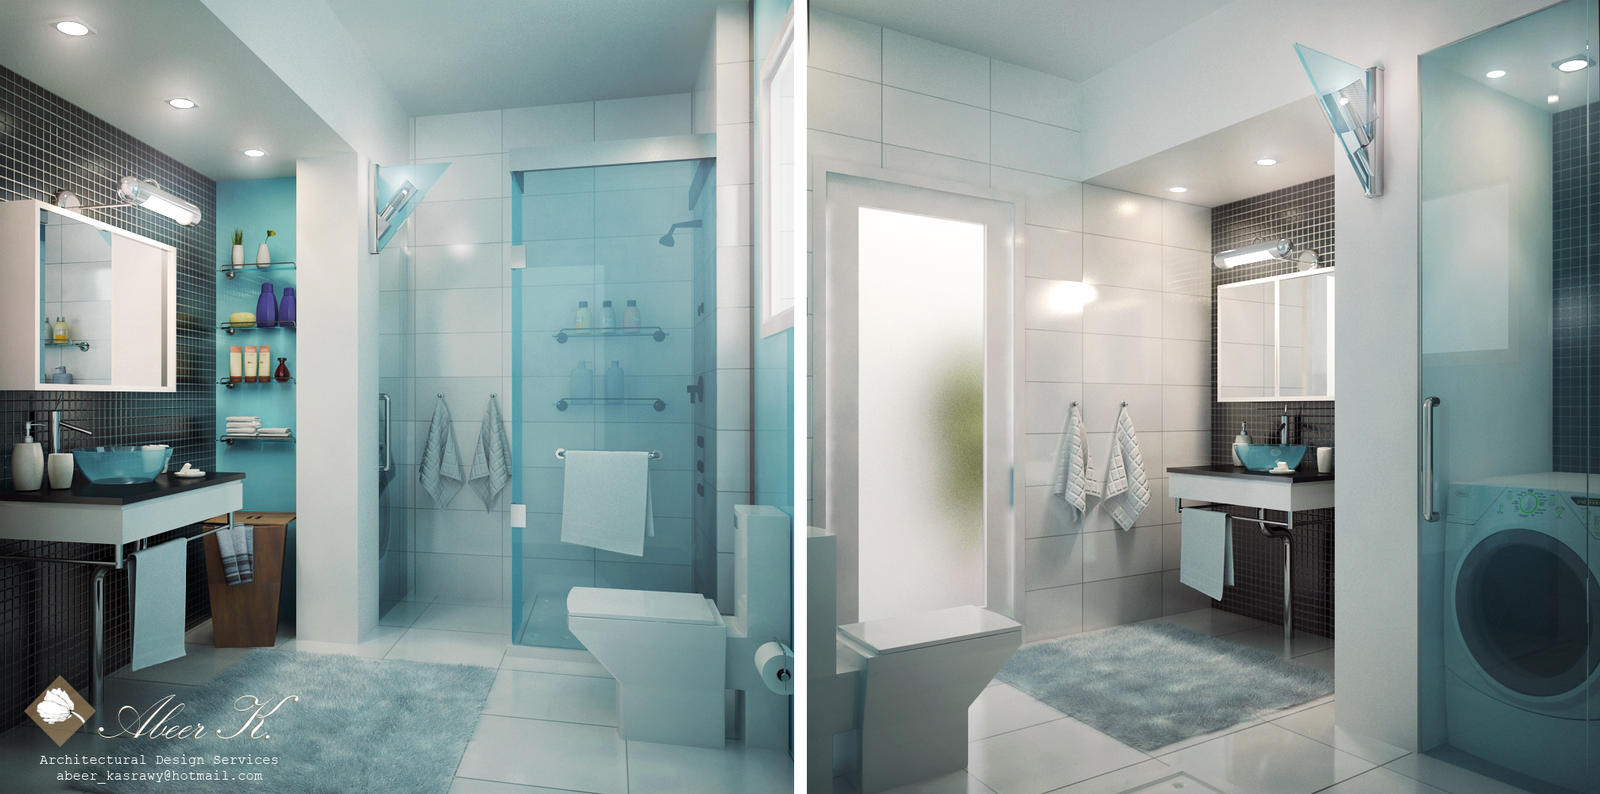 Apartment Master Bathroom modern apartment master bathkasrawy on deviantart